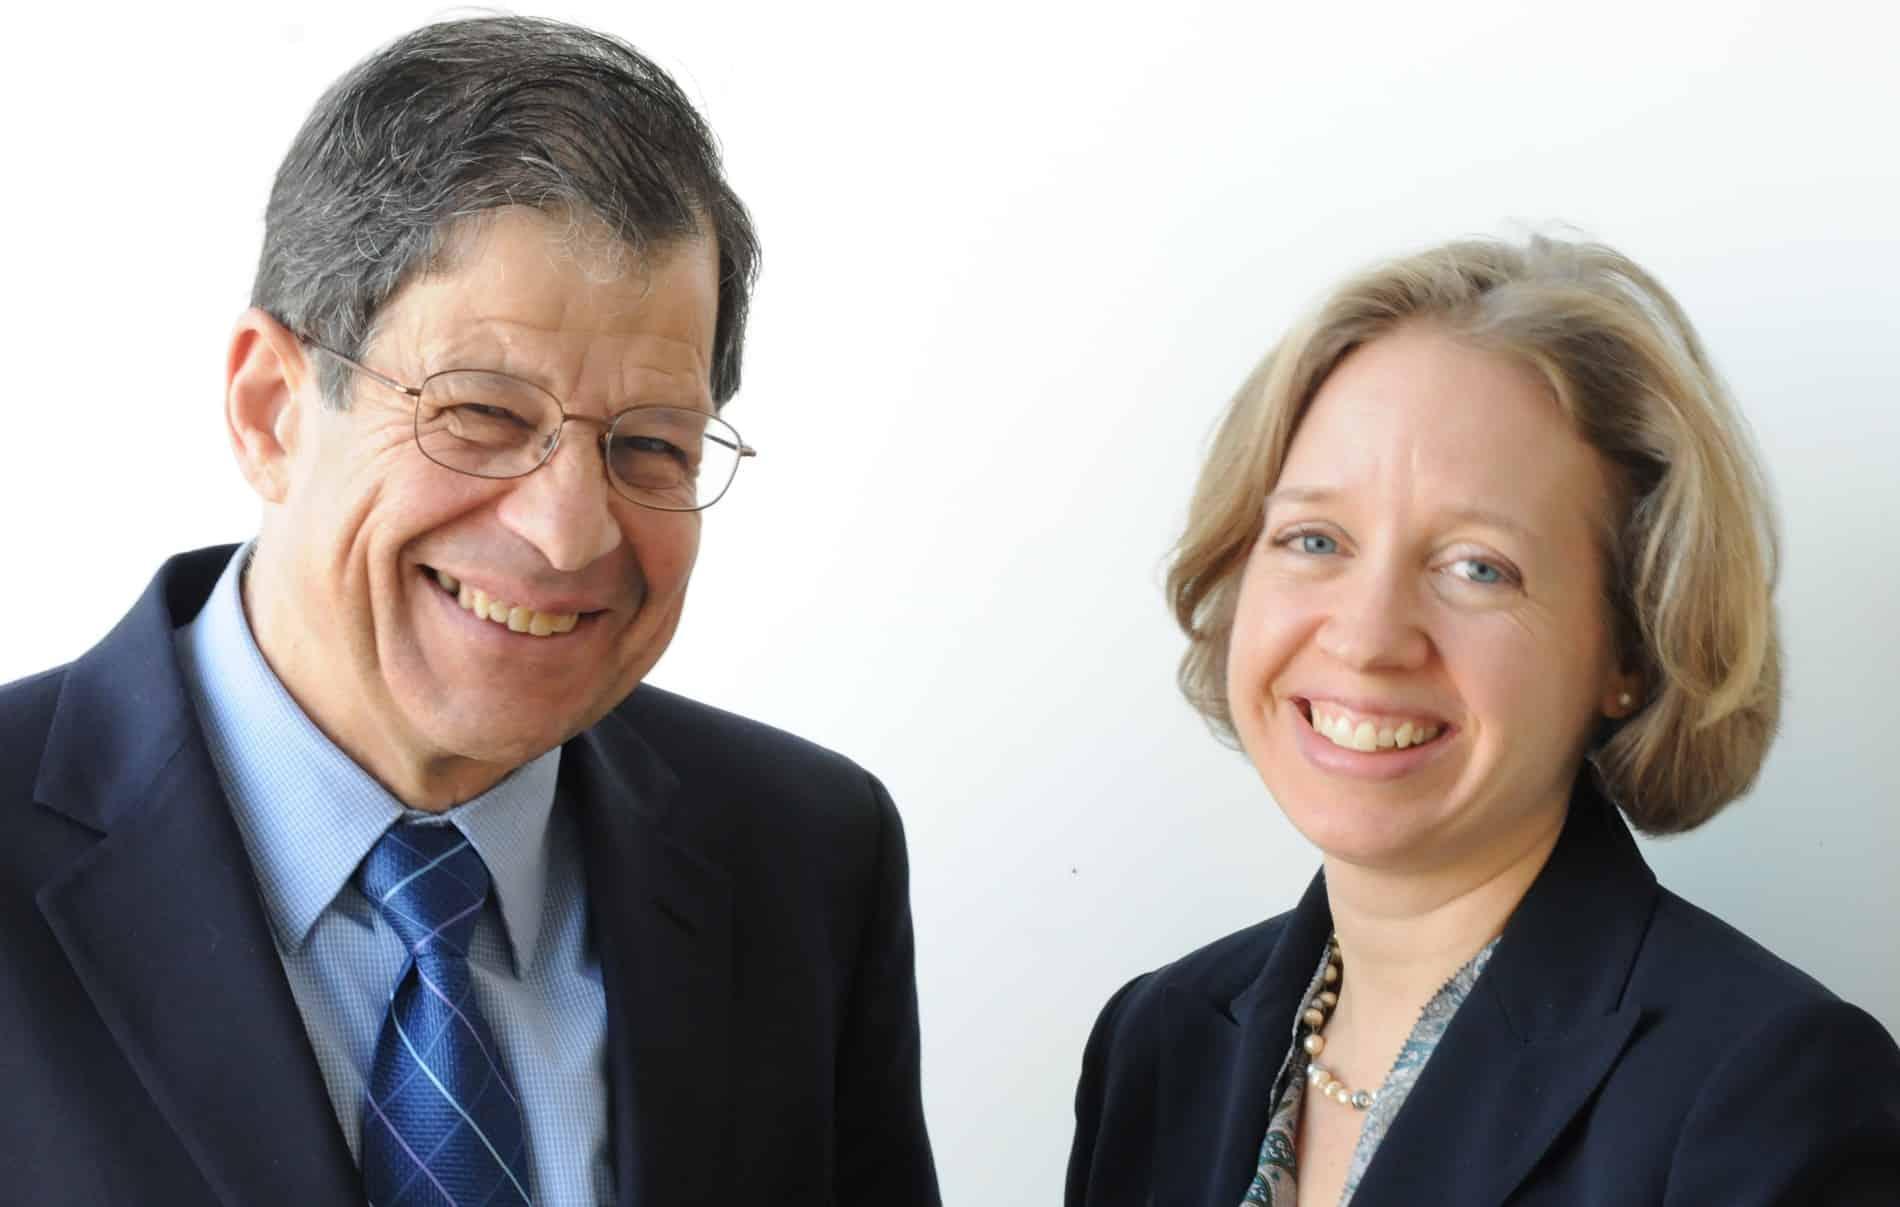 Zick Rubin and Brenda Ulrich